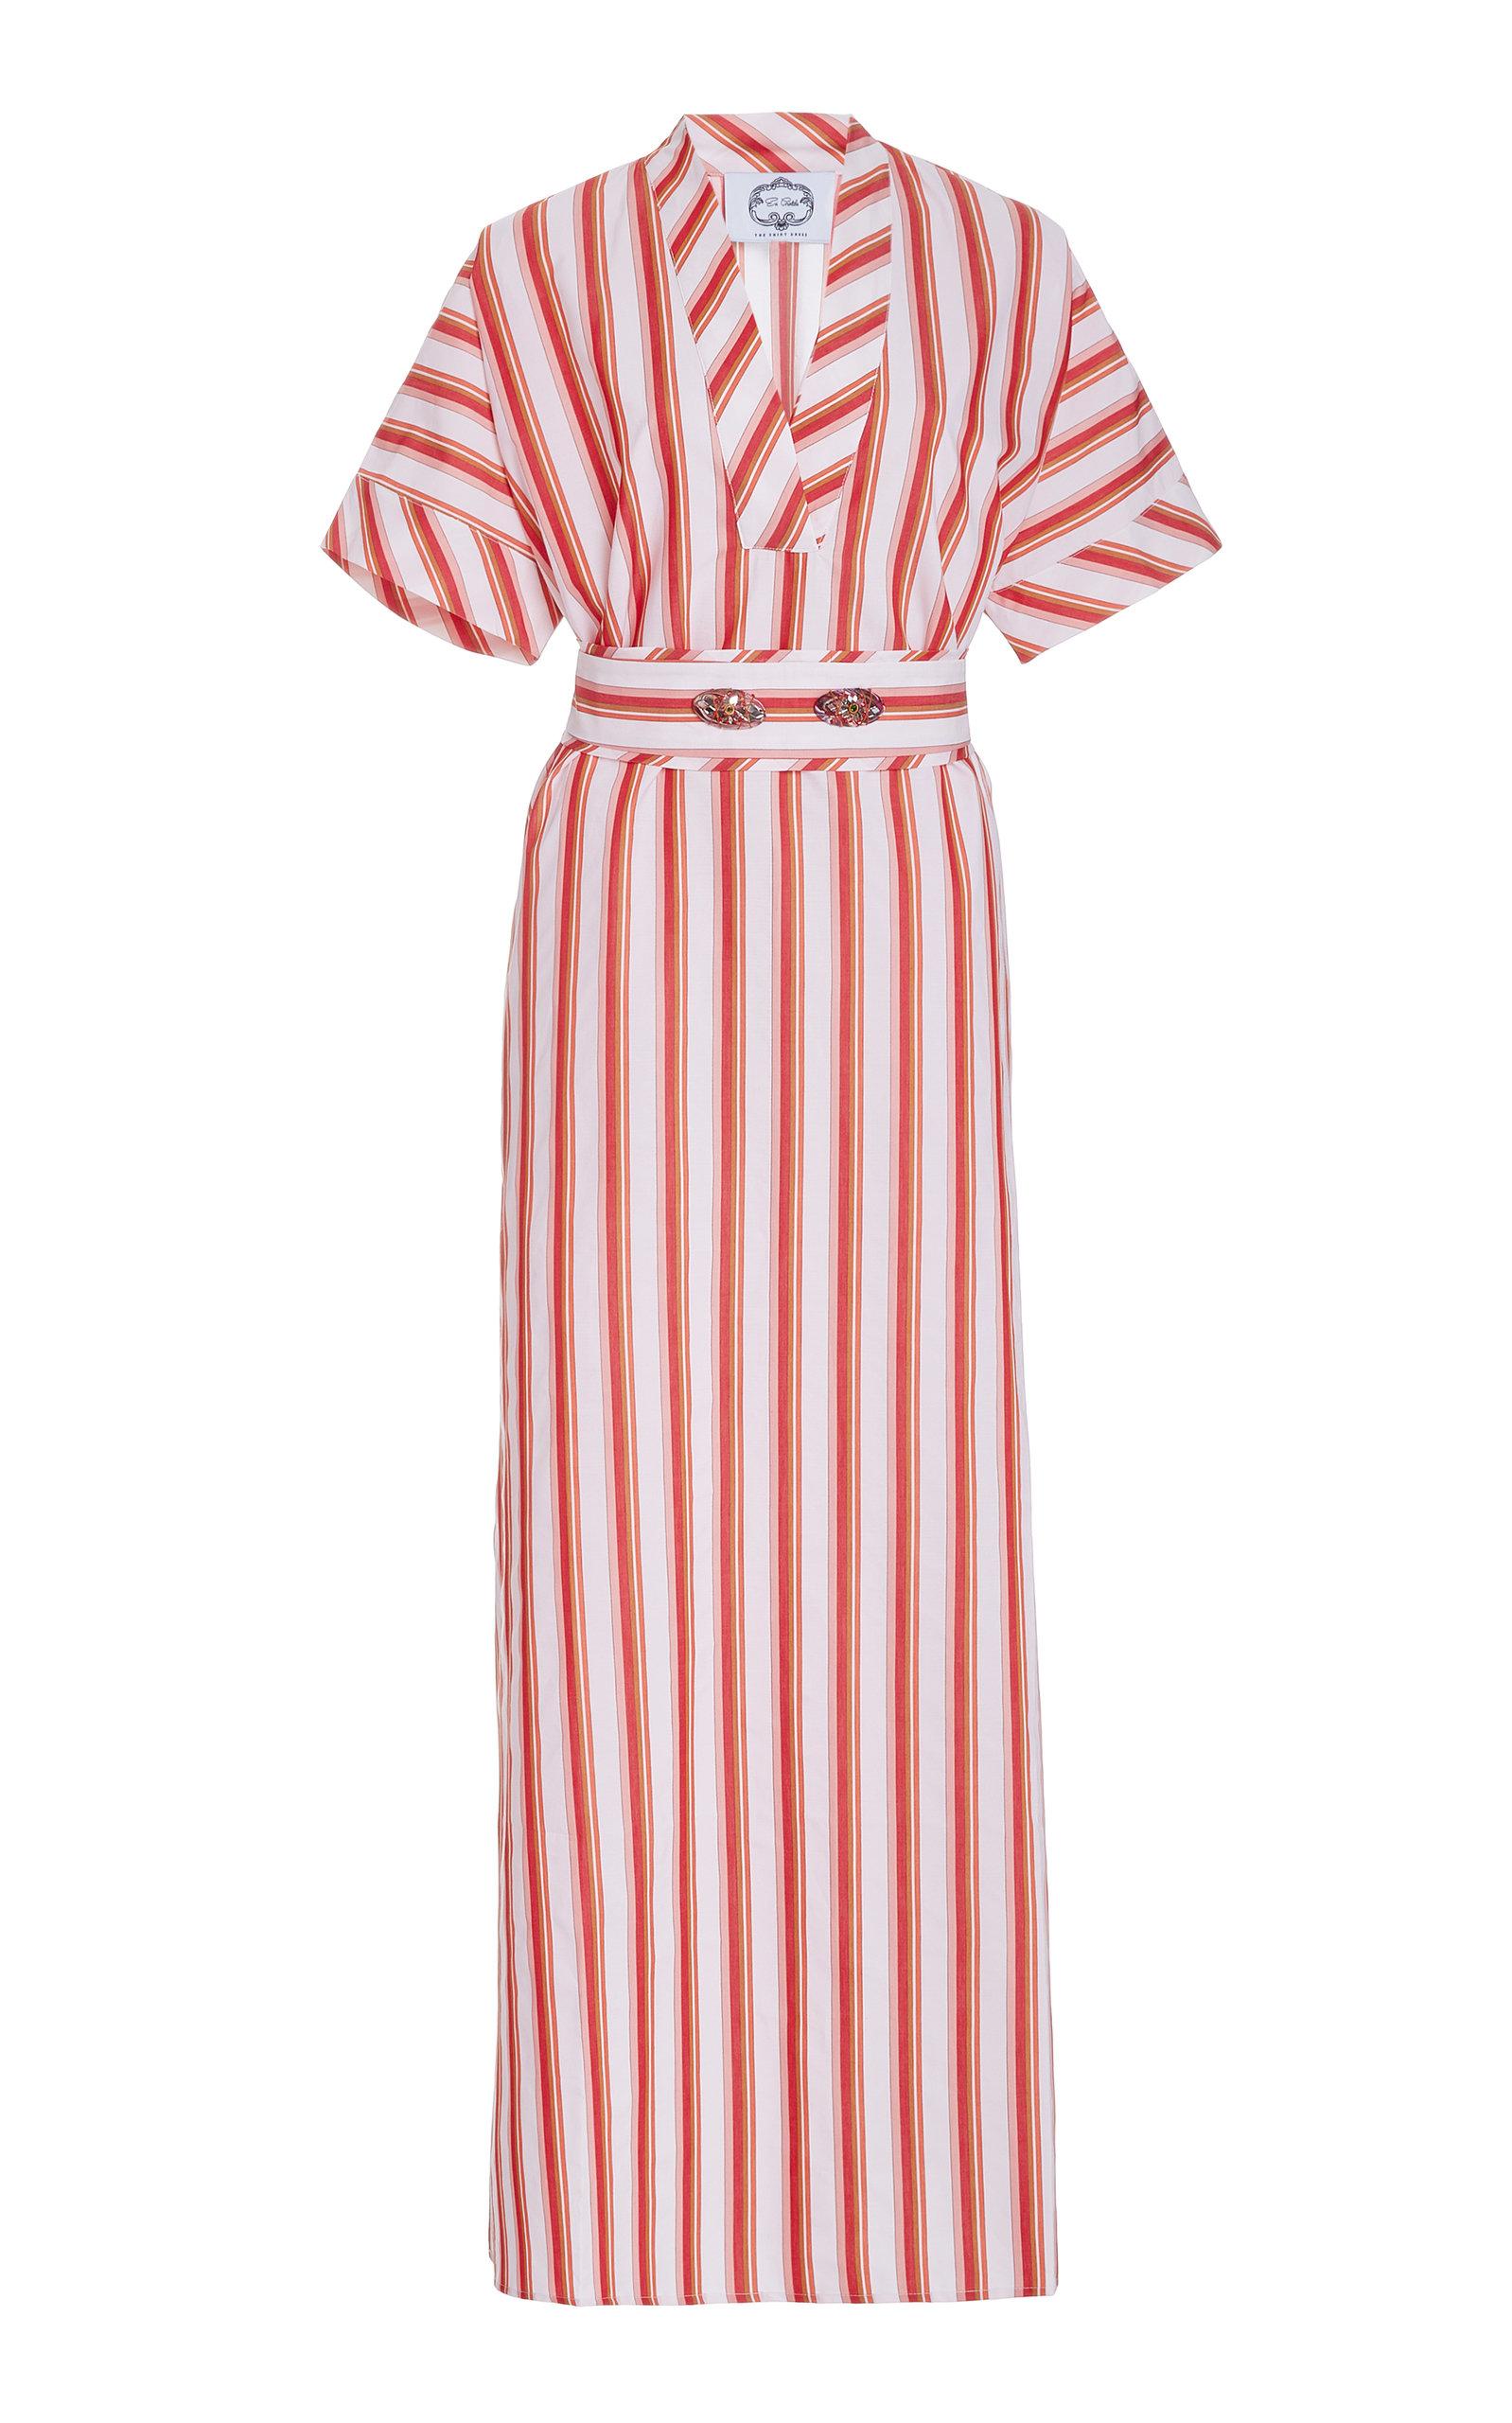 Buy Evi Grintela Mamounia Striped Cotton Dress online, shop Evi Grintela at the best price